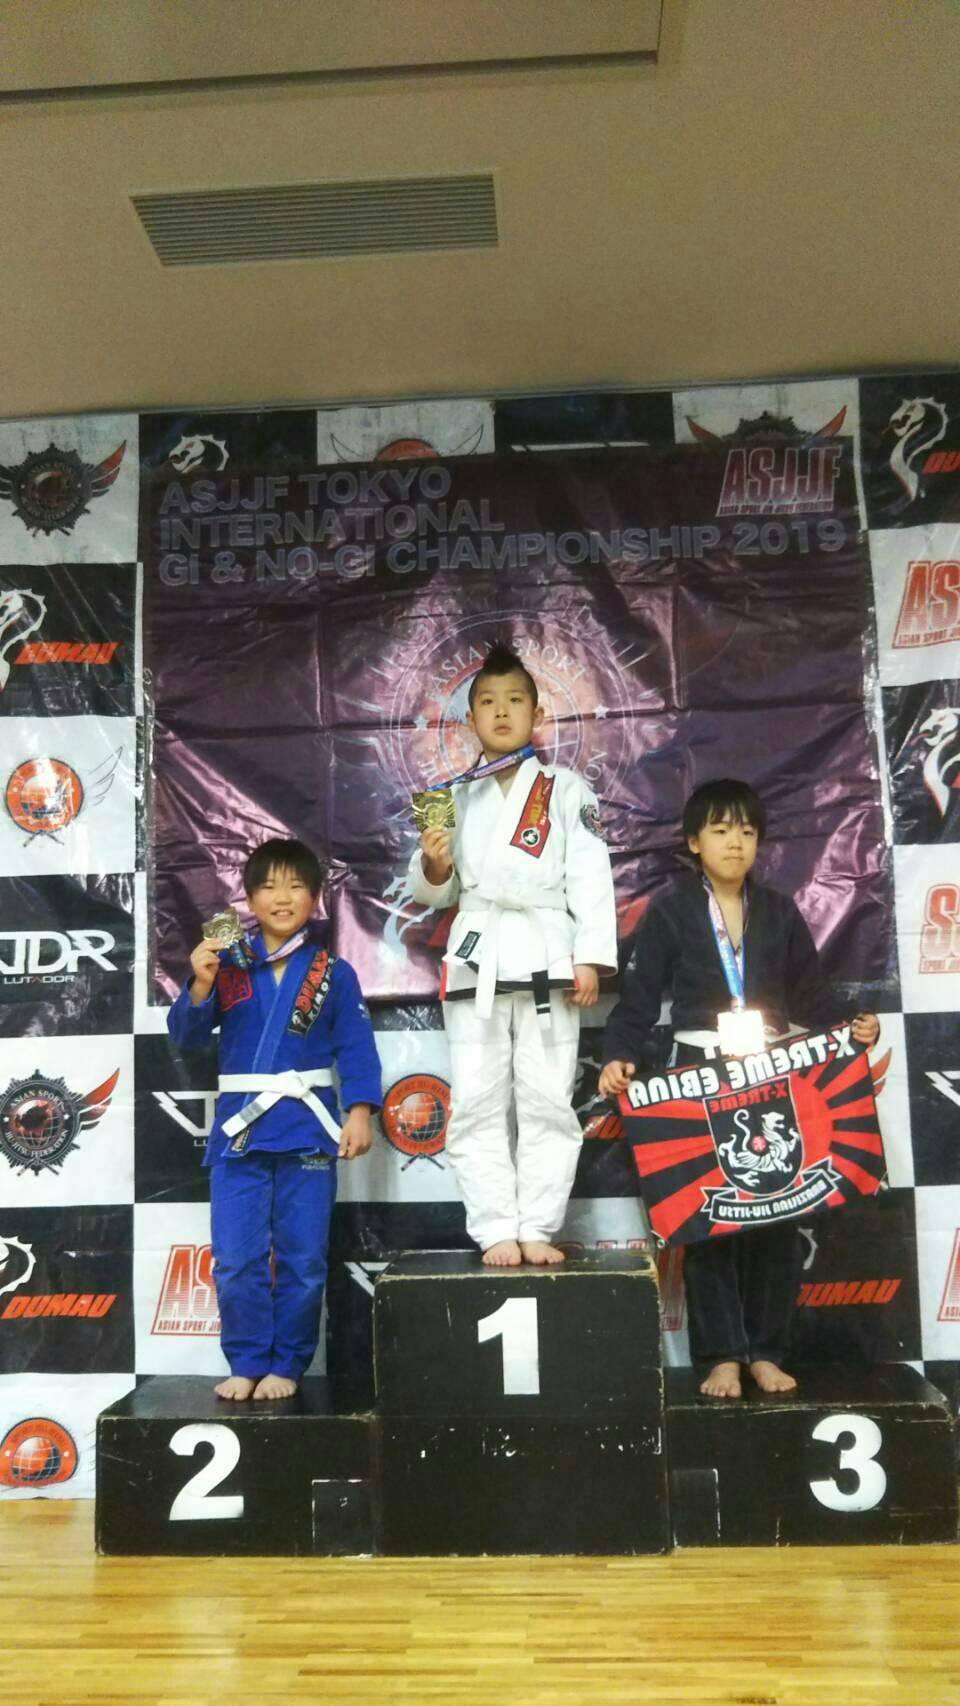 ASJJF 東京国際柔術選手権 2019 その1|大会写4